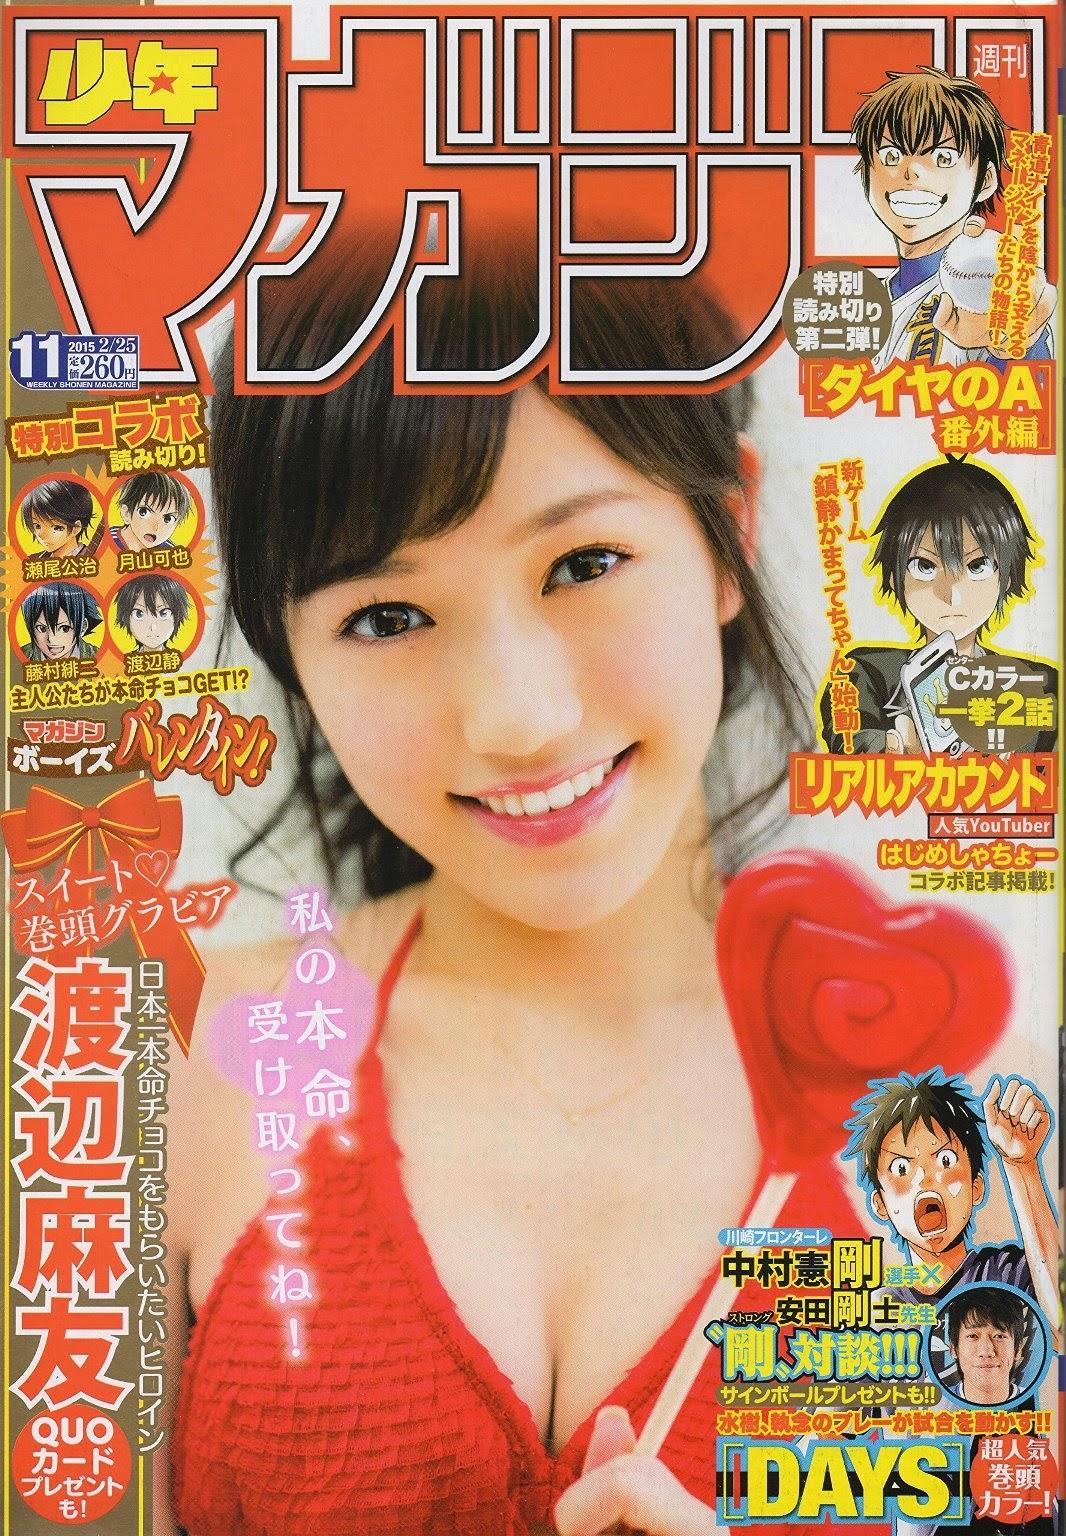 Watanabe Mayu 渡辺麻友 Weekly Shonen Magazine No 11 2015 Cover